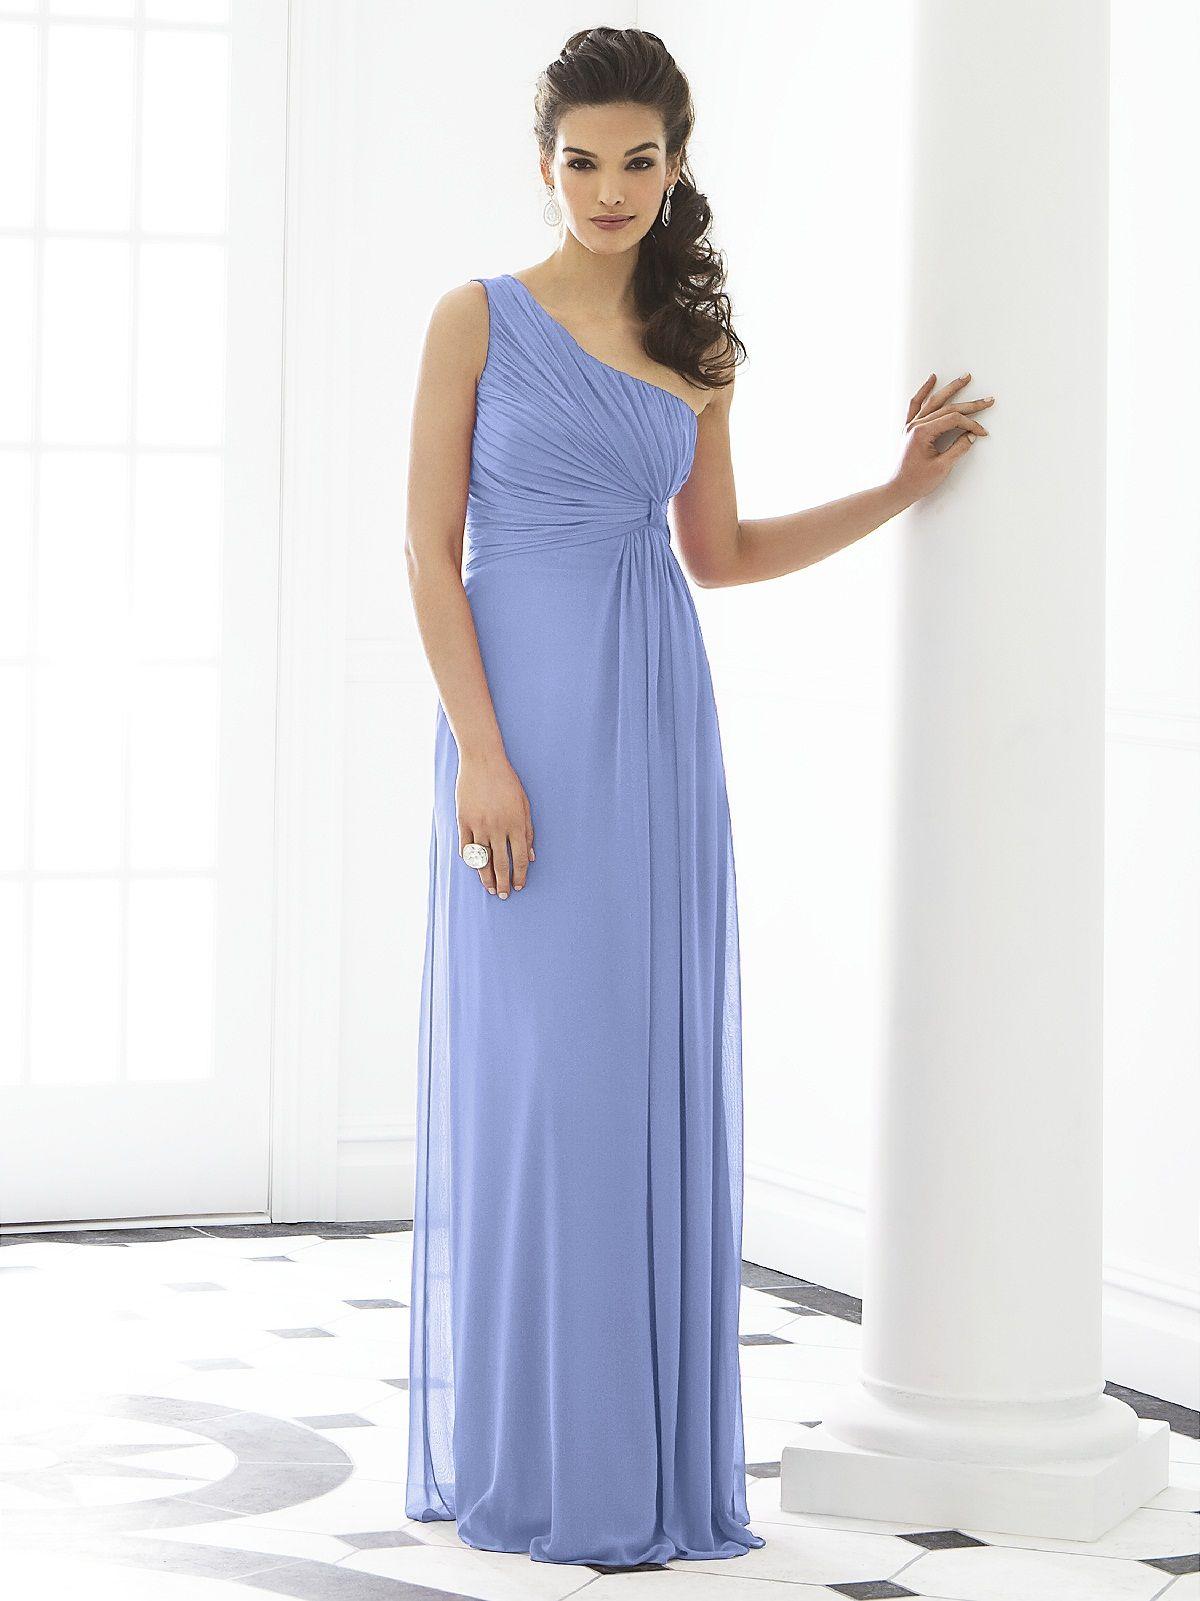 After Six Bridesmaid Dress 6651 | Periwinkle dress, Bridesmaid ...